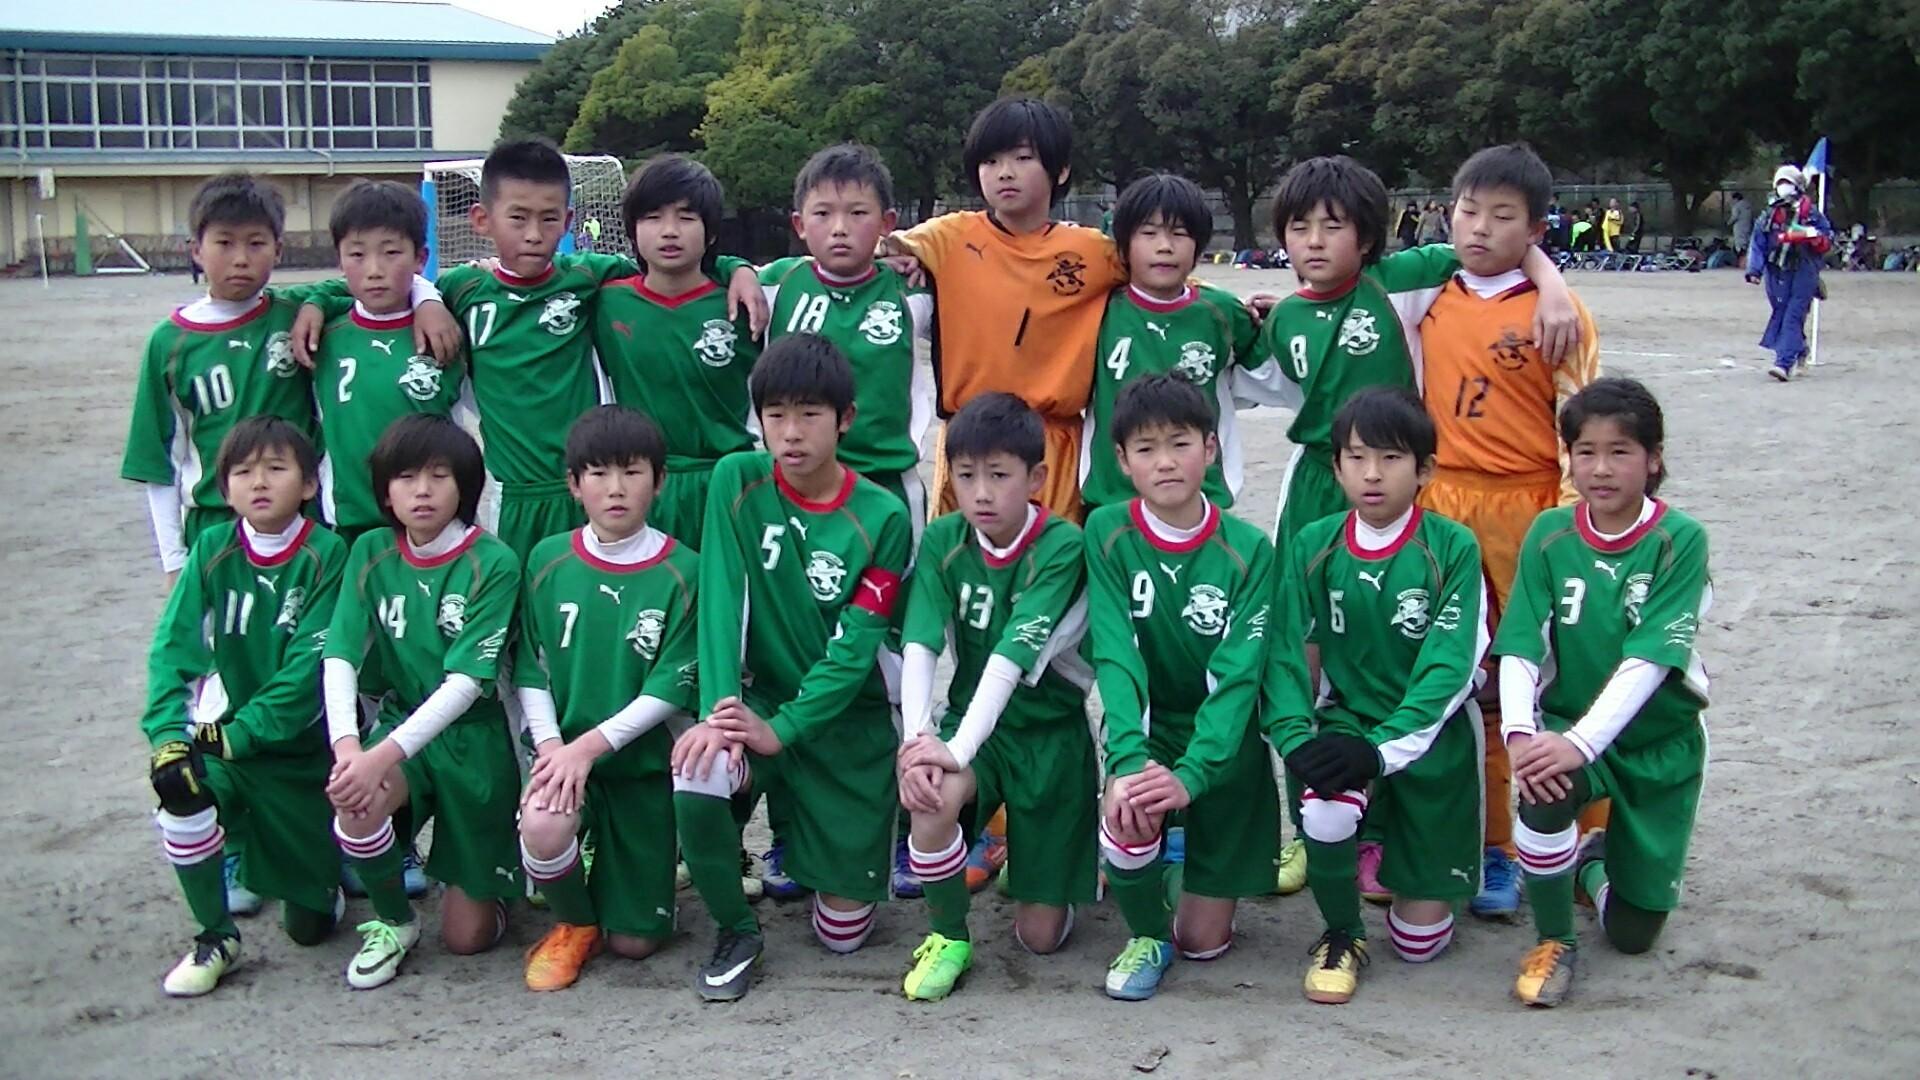 1/14 U-12 神奈川県少年サッカー選手権大会